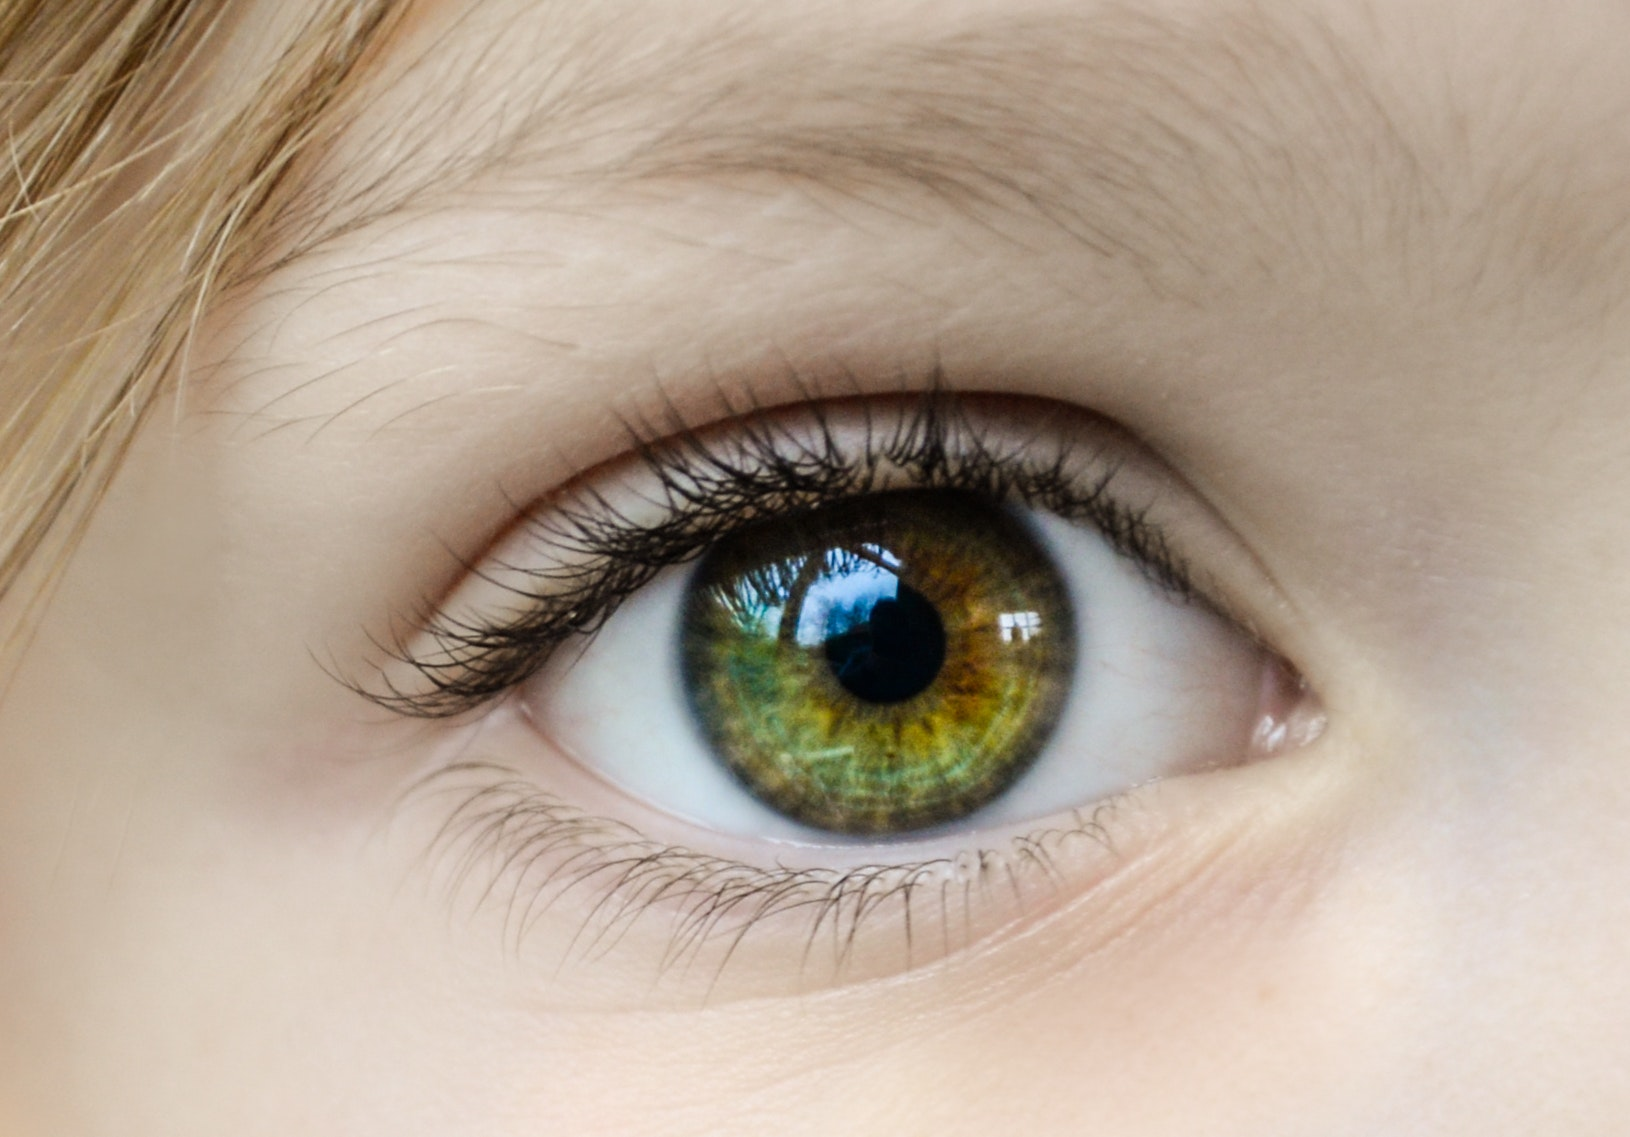 Close Up Eye Eyeball 862122 Mark Davis Optician